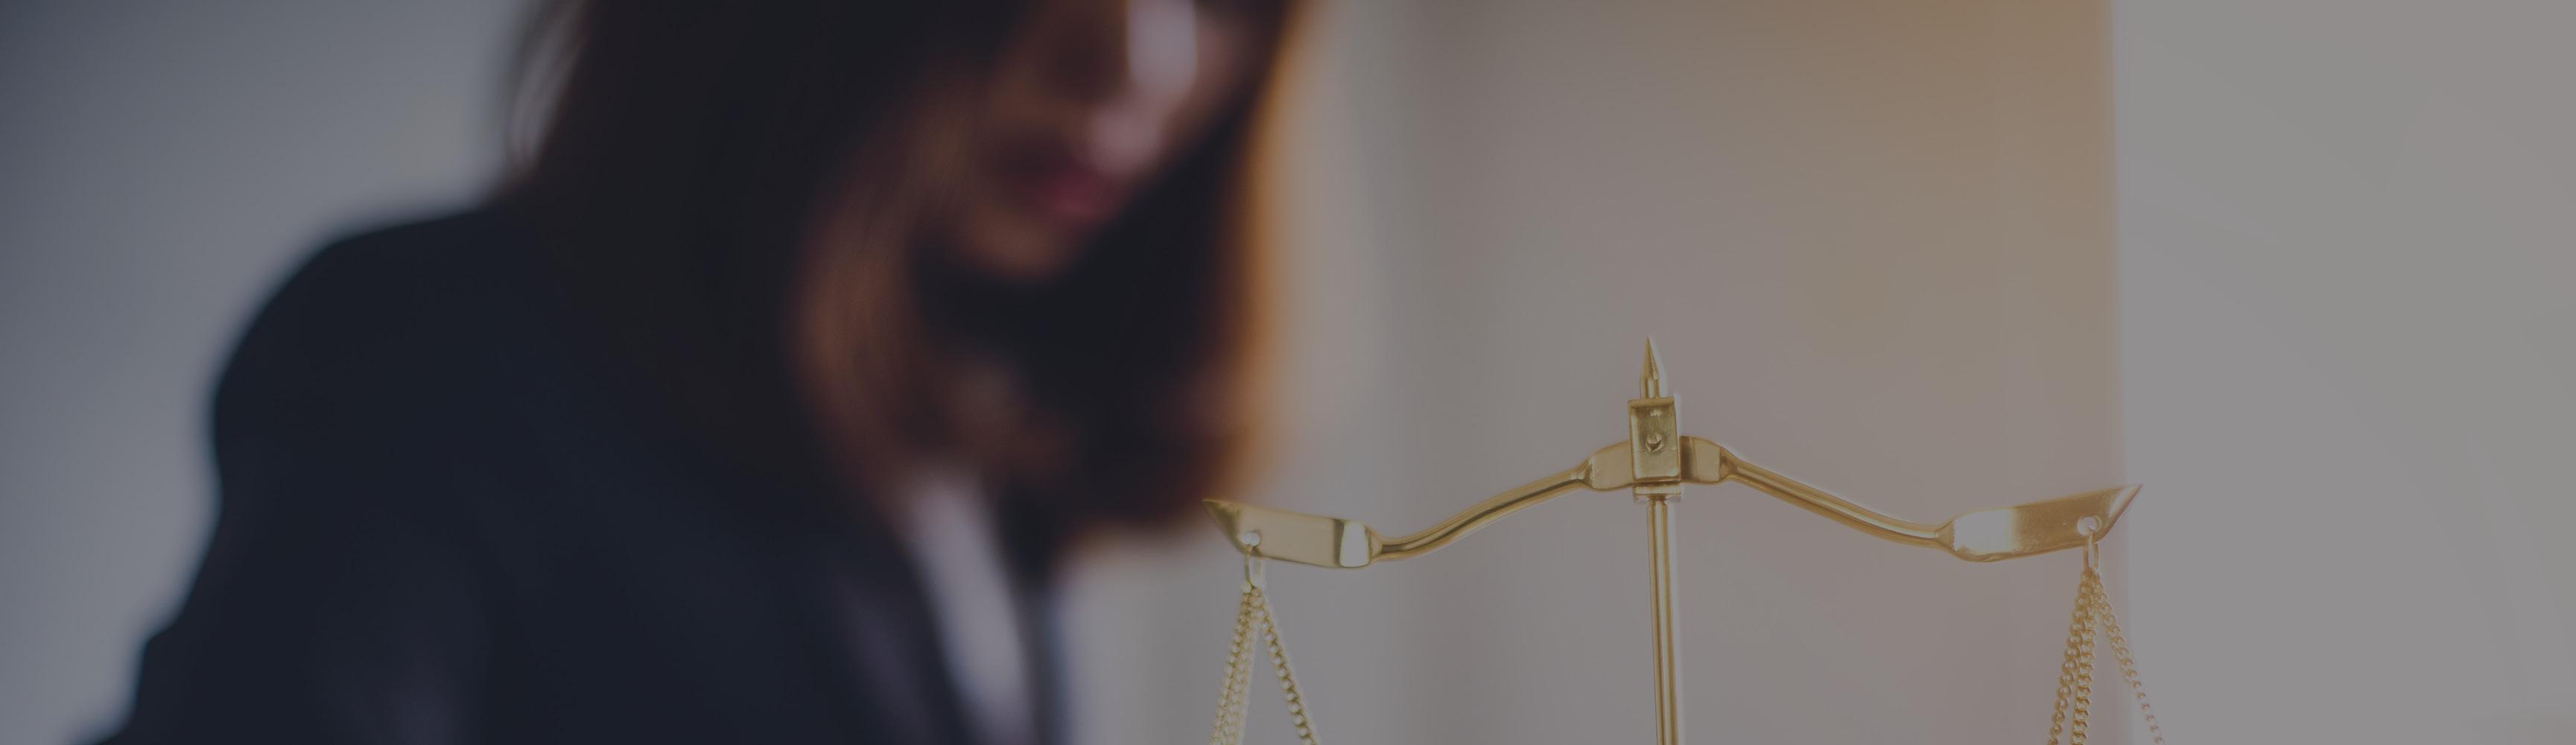 Kali DRI Young Lawyers blog hero